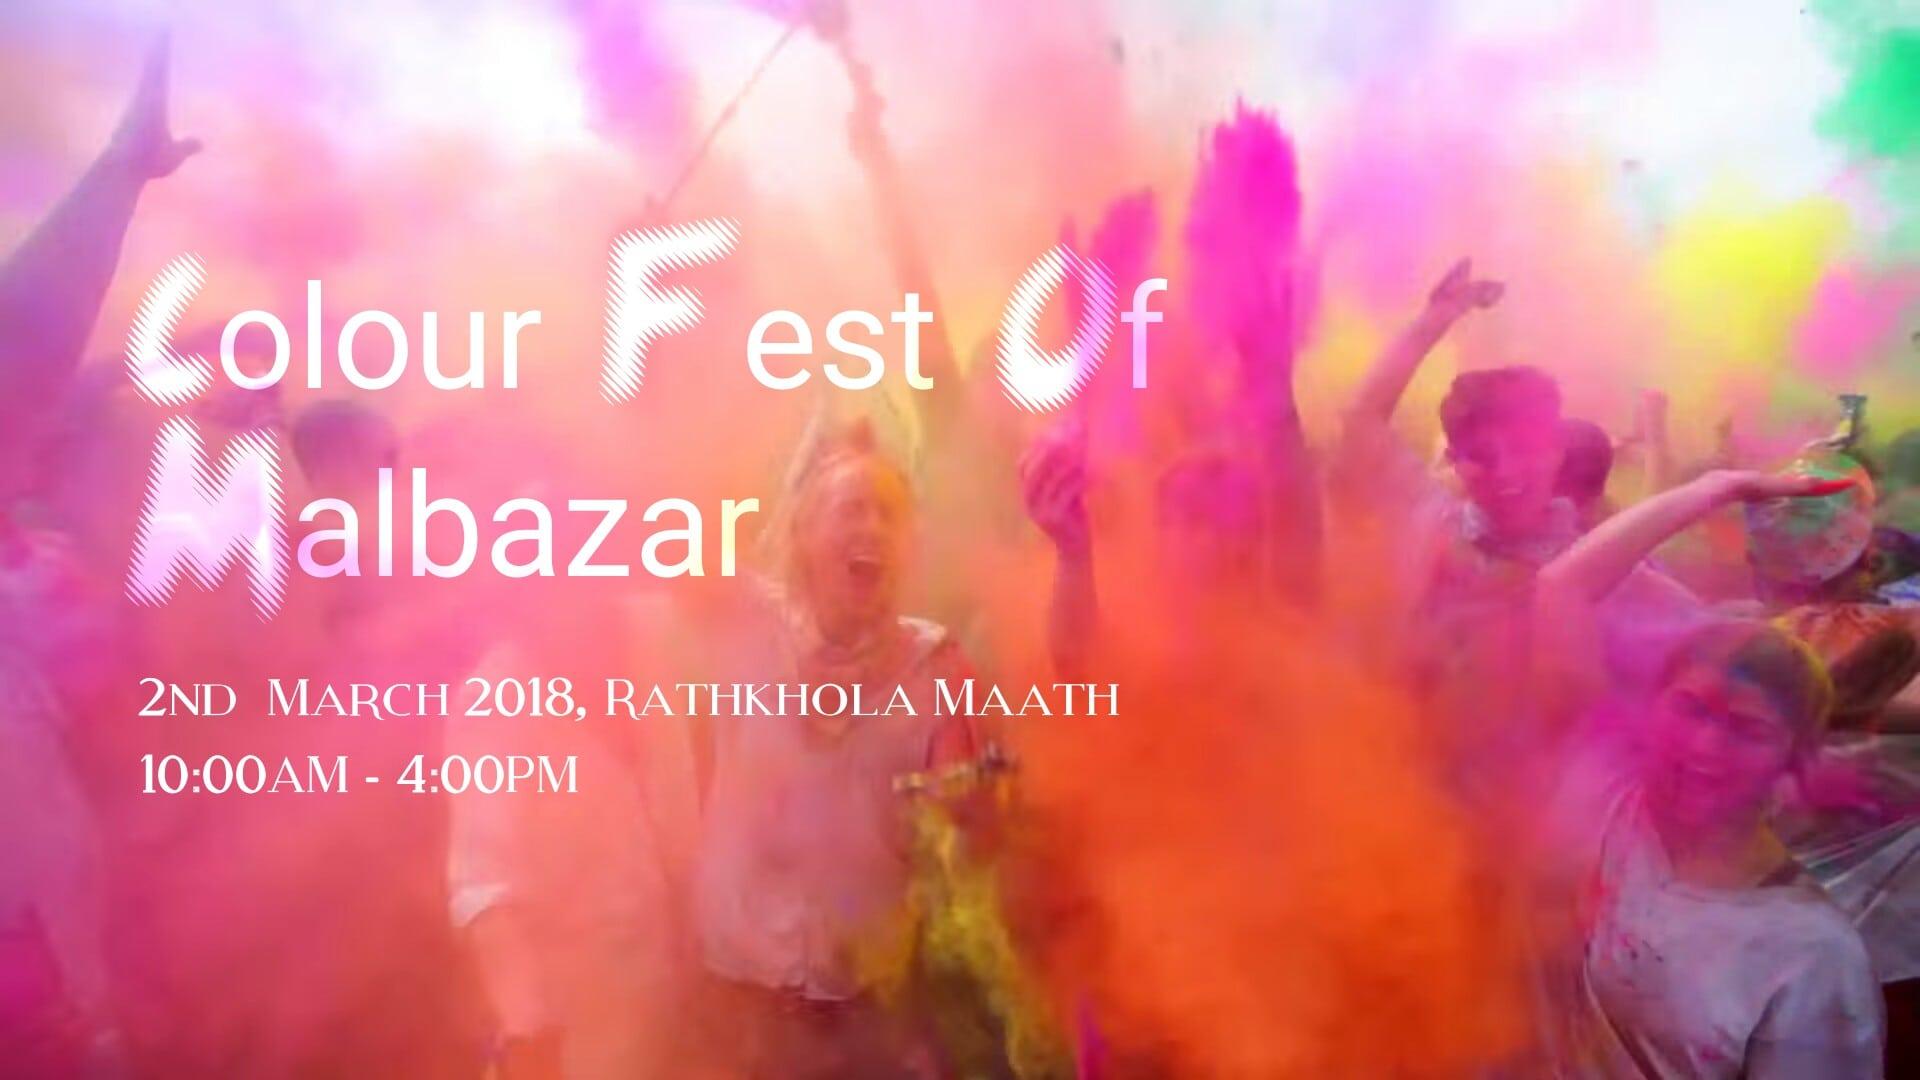 Colour Fest 2018 Malbazar